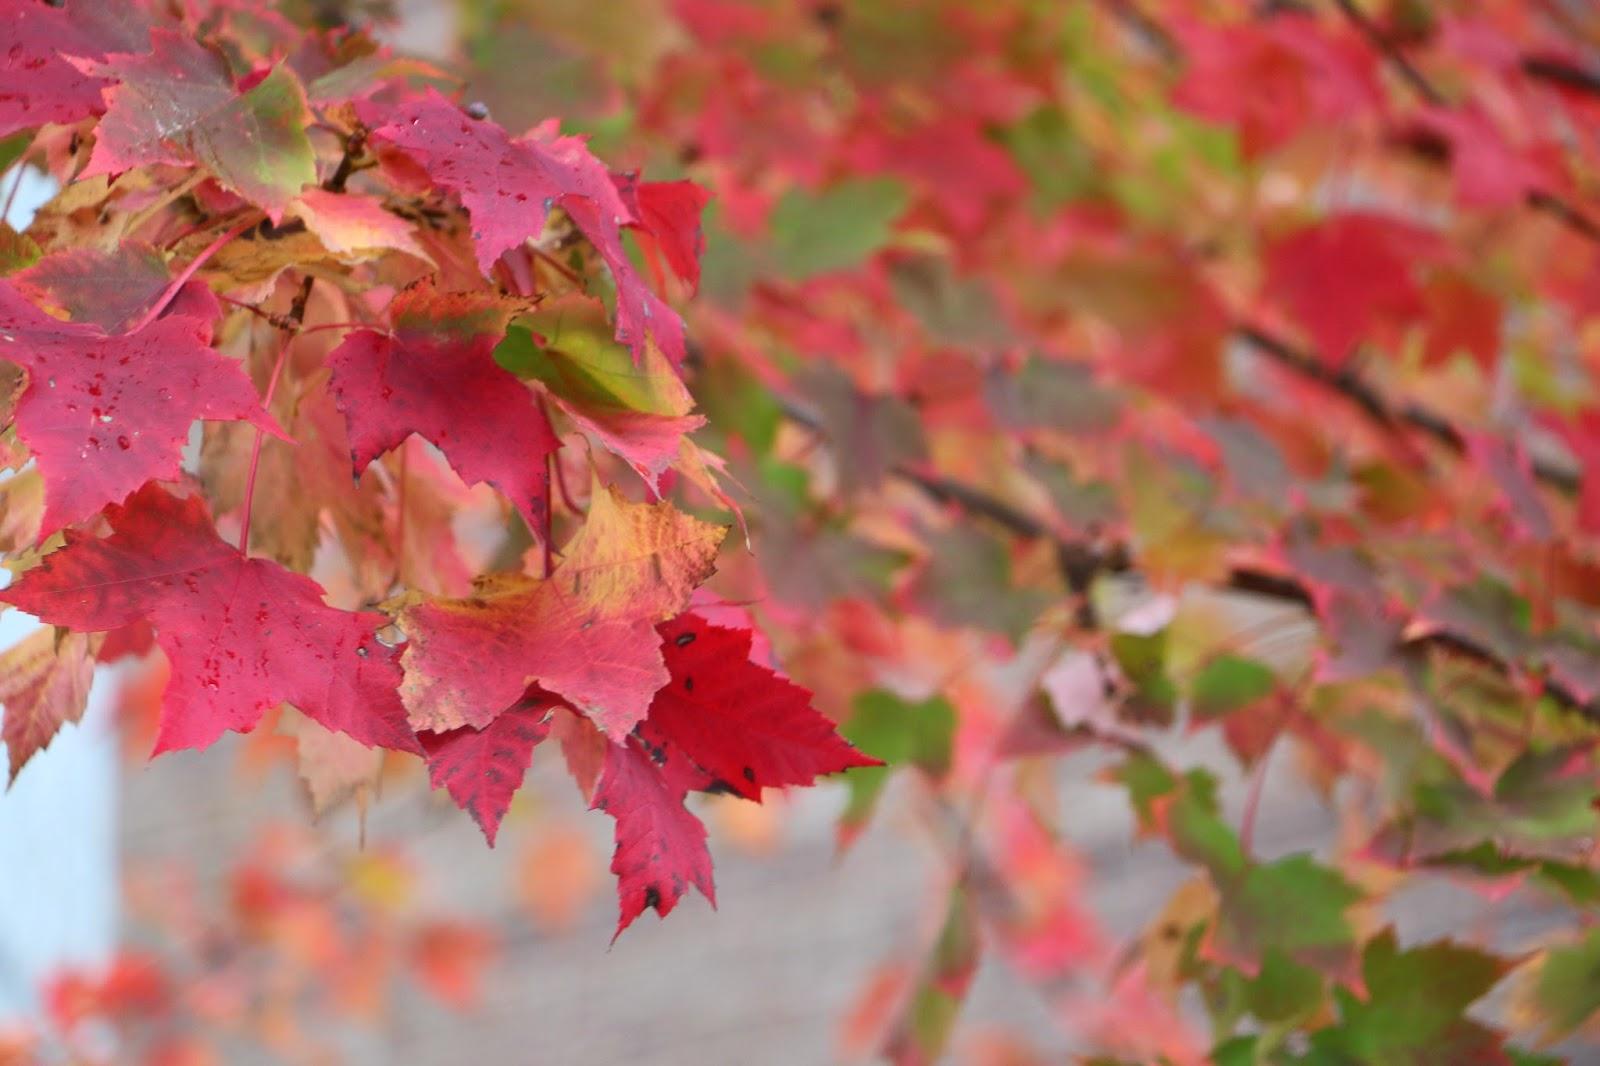 """Les Feuilles d'Automne...The Fall Leavess'-1c Photo Shahrzad Ghaffari MVM- 21 OCT 2014"